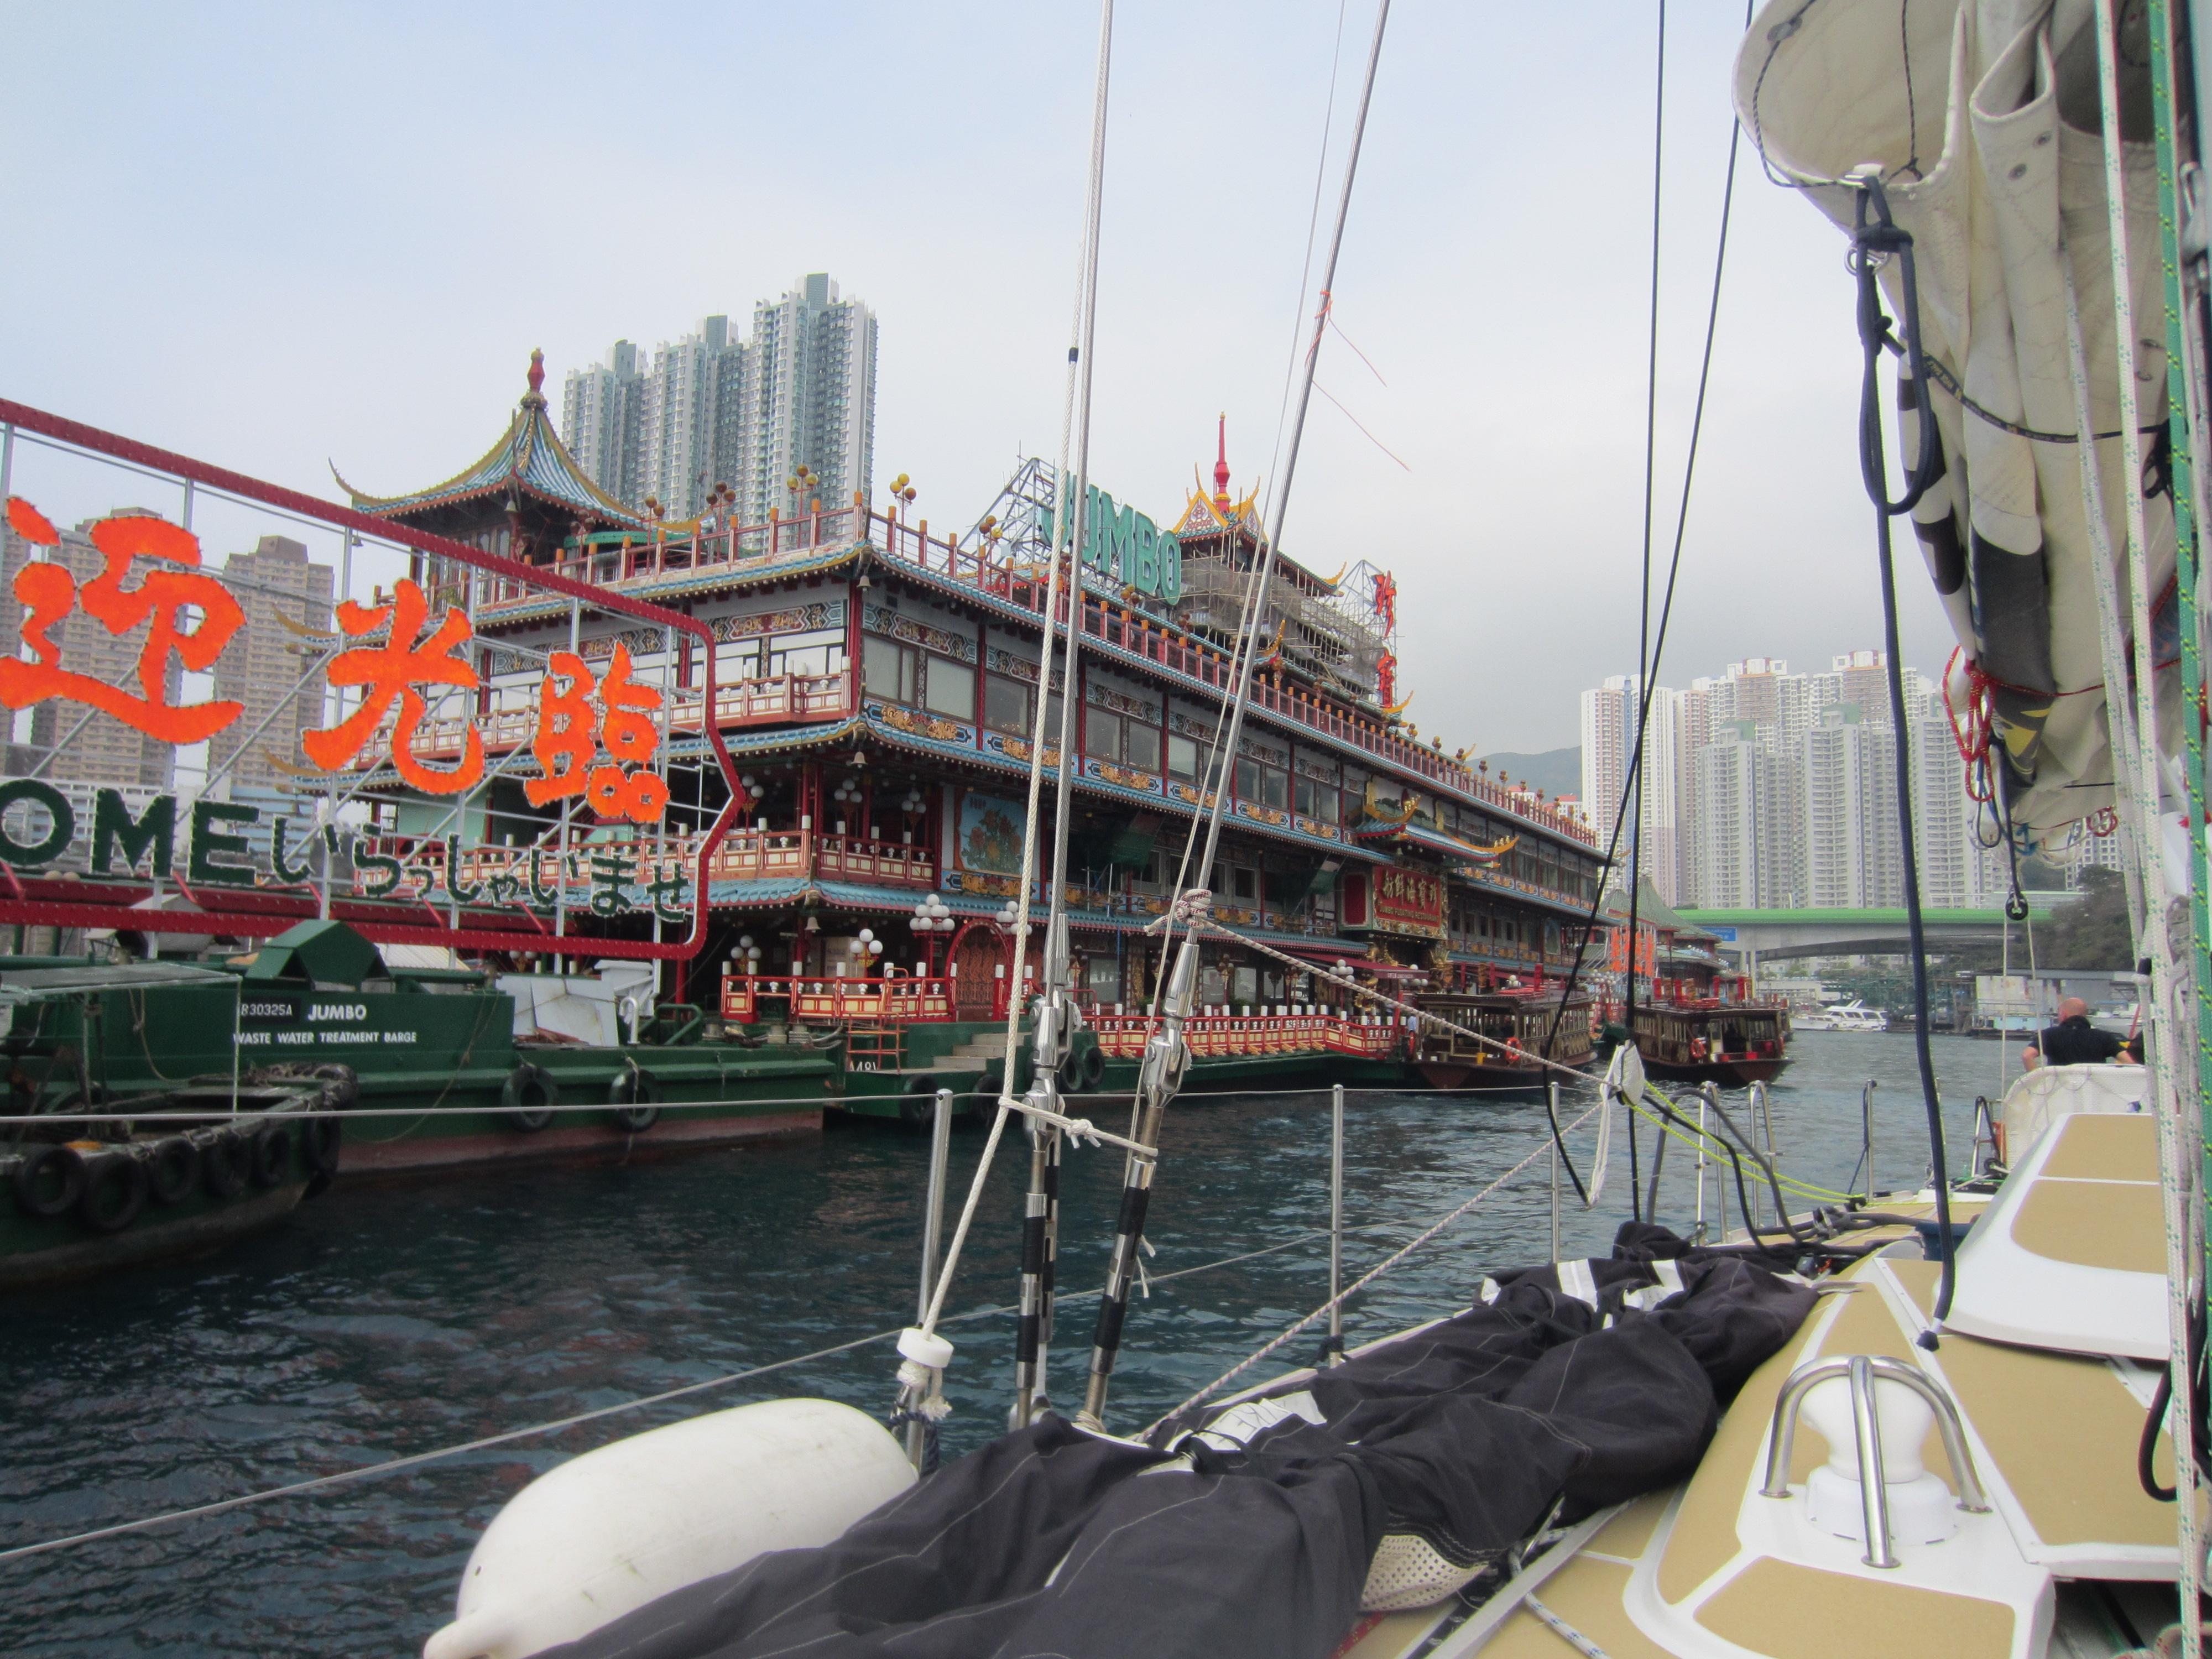 Jumbo, a floating Chinese Restaurant